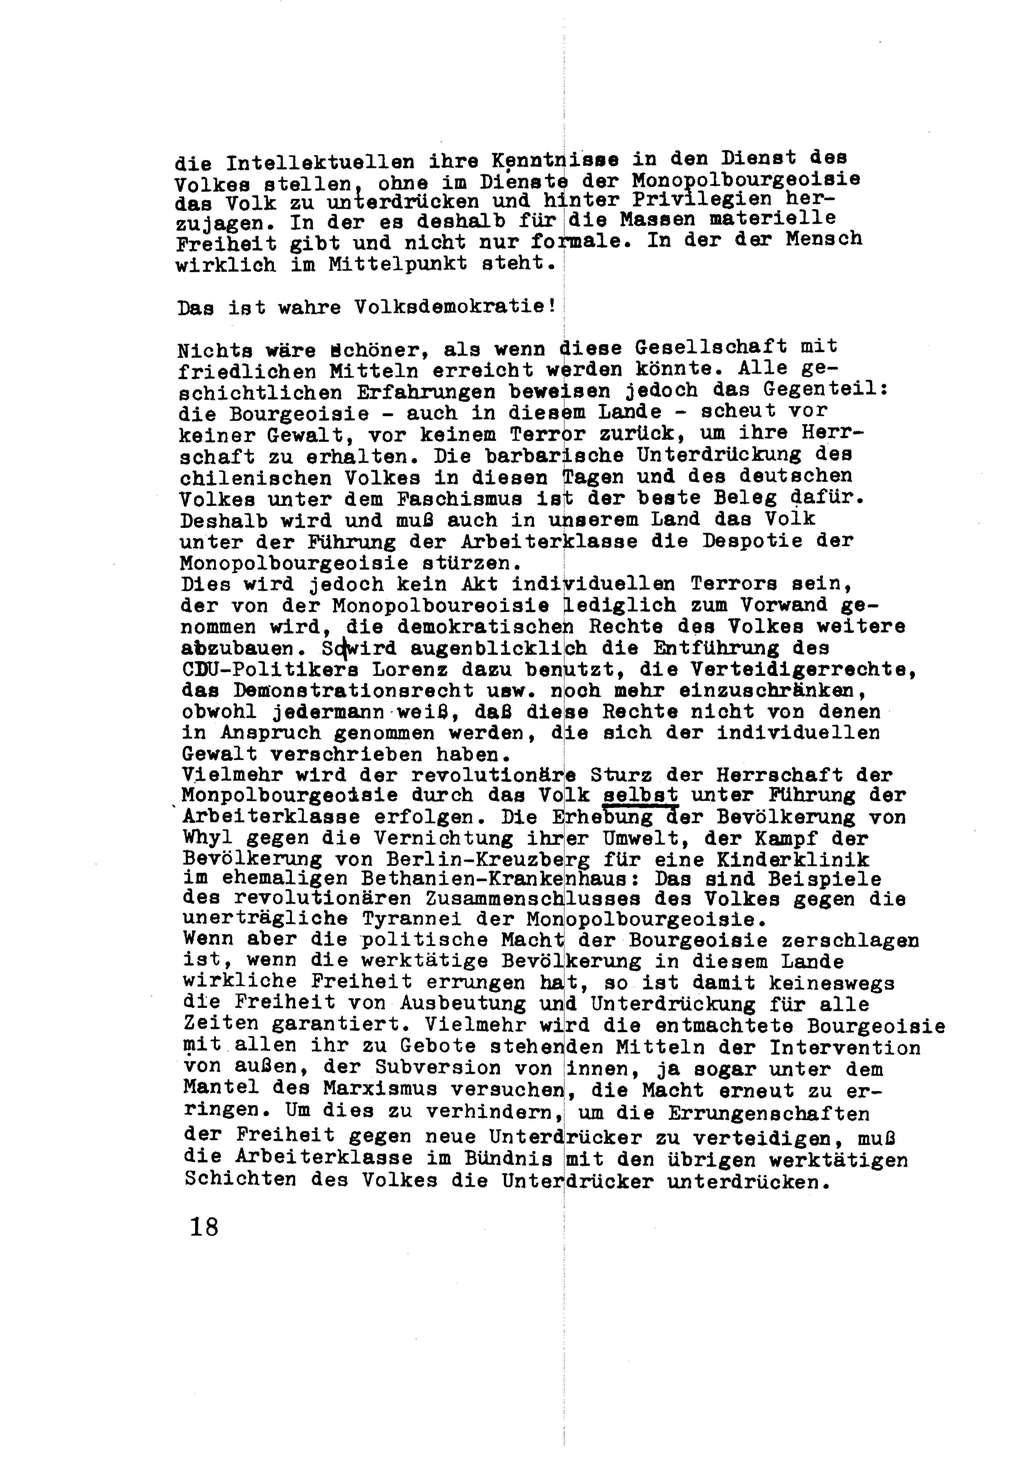 RHeV_Anschuldigung_RA_Gildemeier_Seite_18